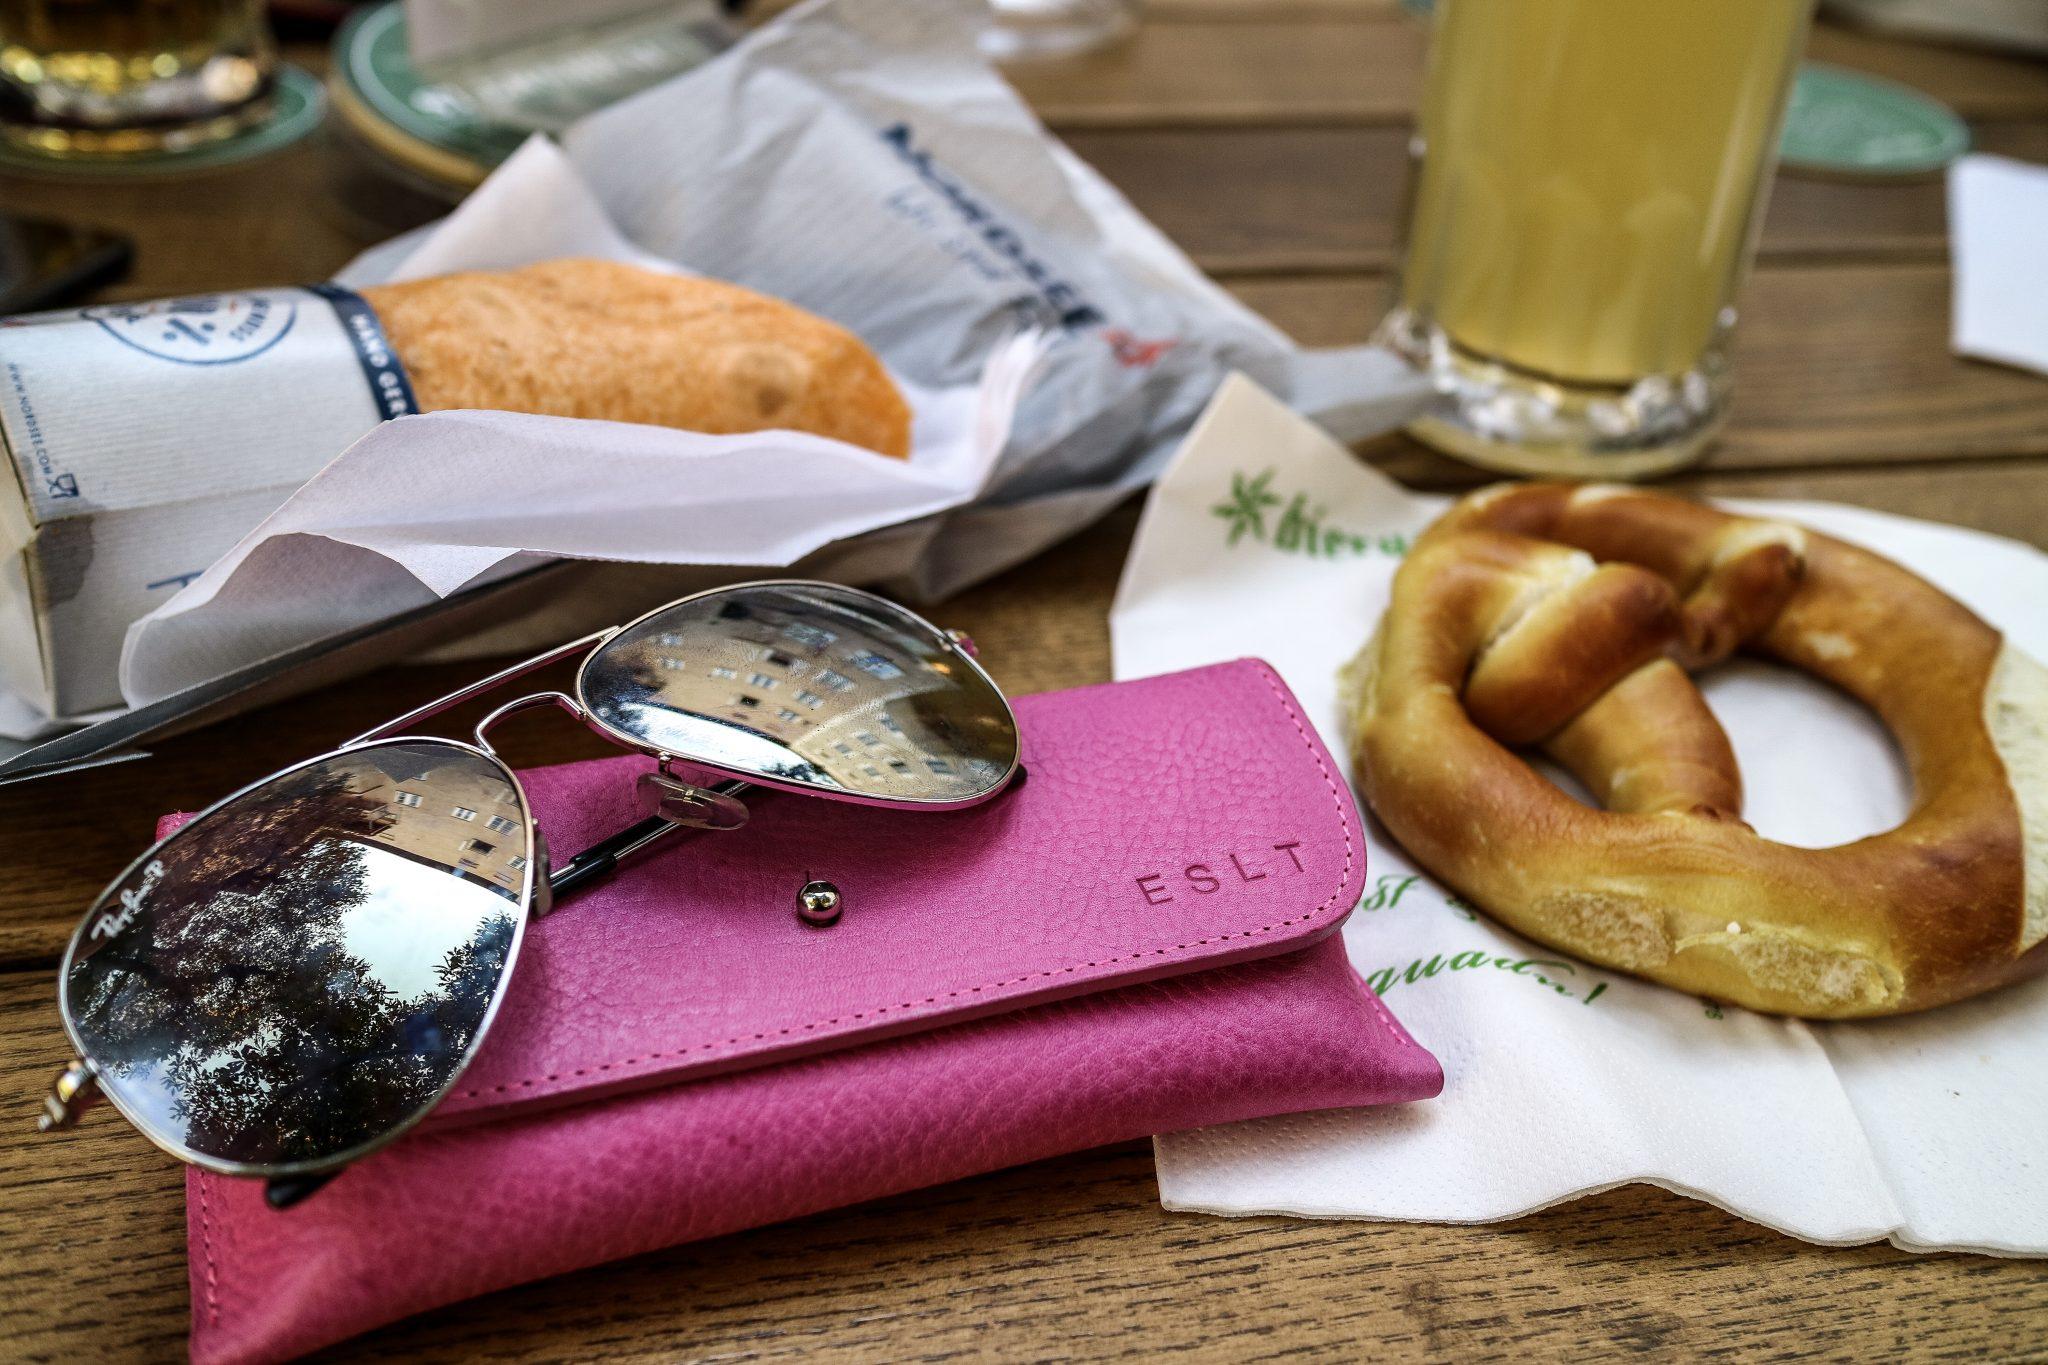 Sunglasses case from British Belt Company